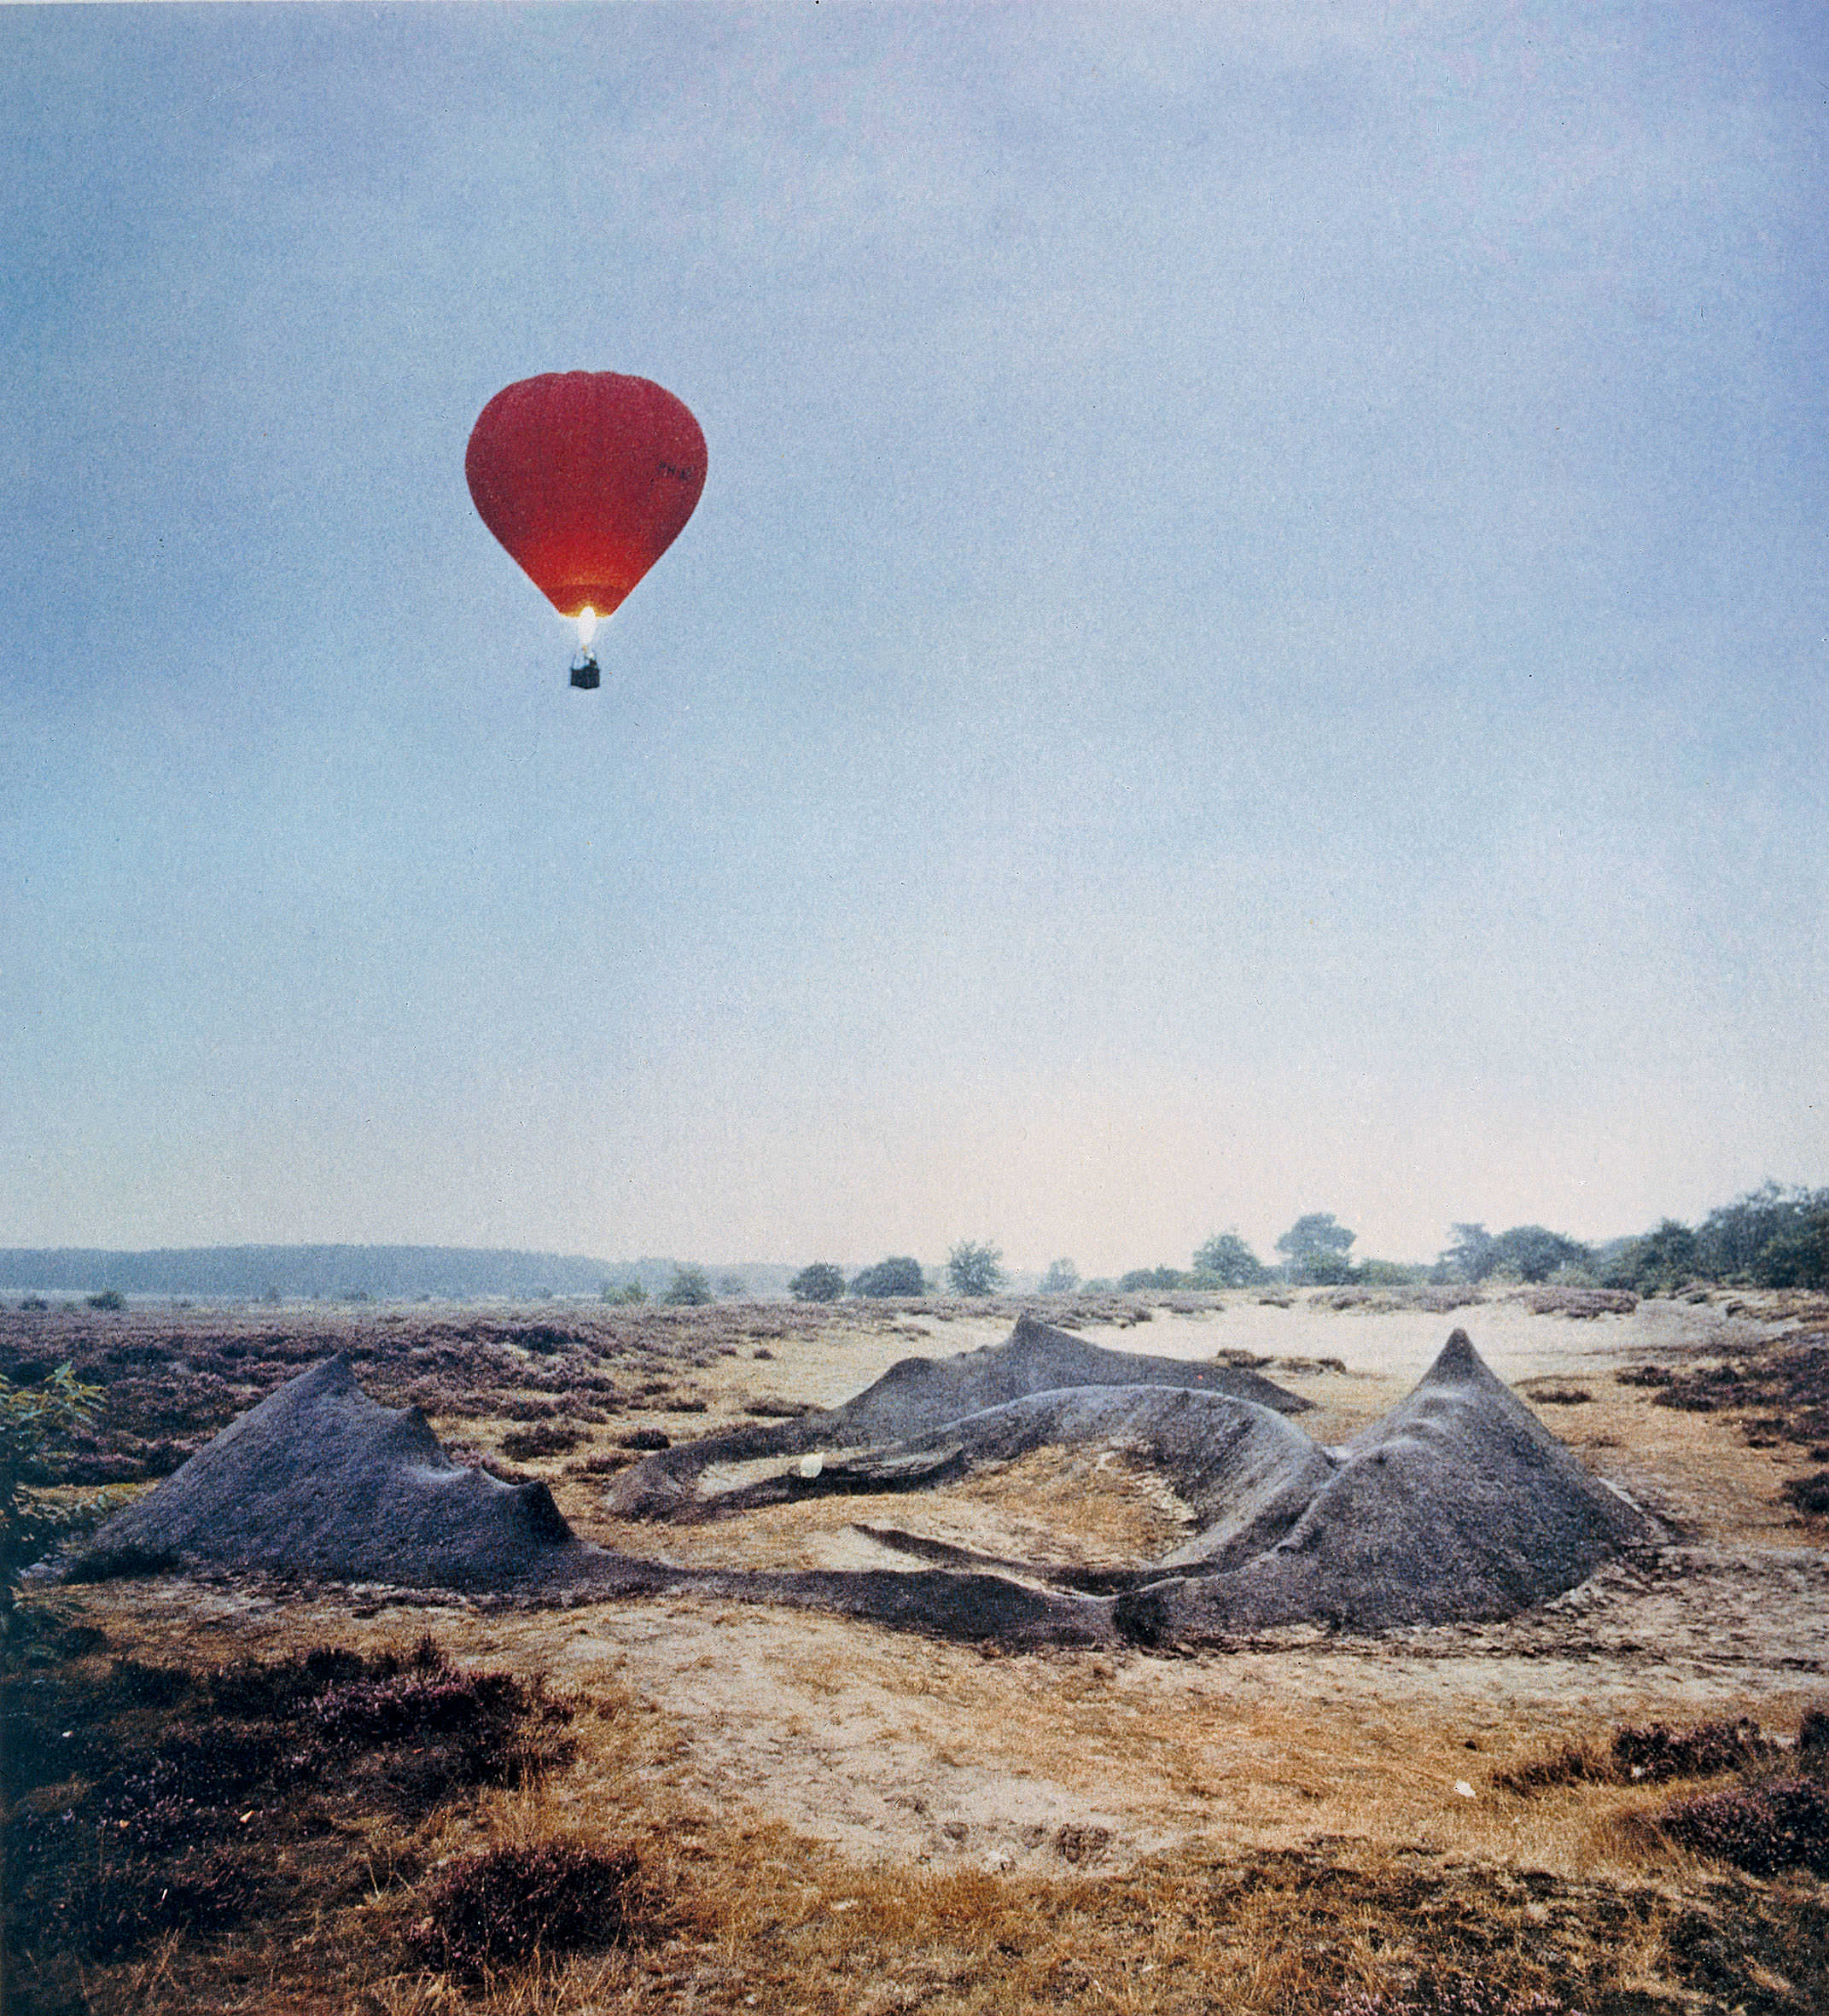 Marco Bagnoli, Albe of Zonsopgangen, pallone aerostatico, terra e stroboscopio, brughiera di Laren 1984. Fotografia di Jan Schot rielaborata